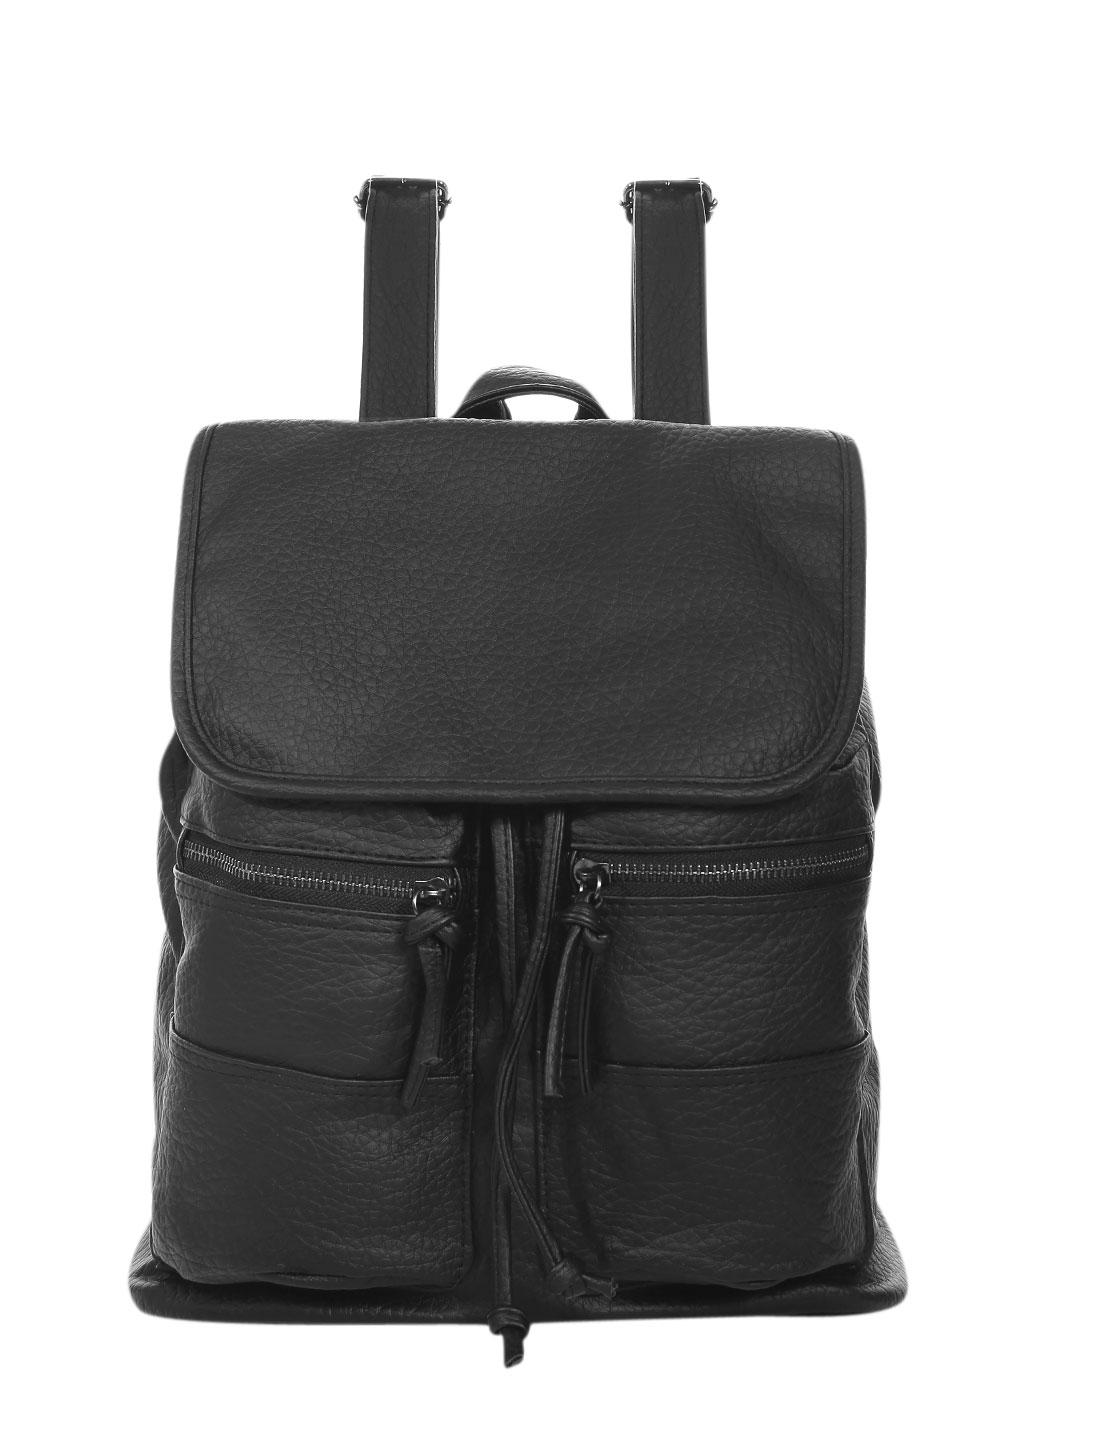 Women Press Stud Closure Flap Top Drawstring Backpacks Black